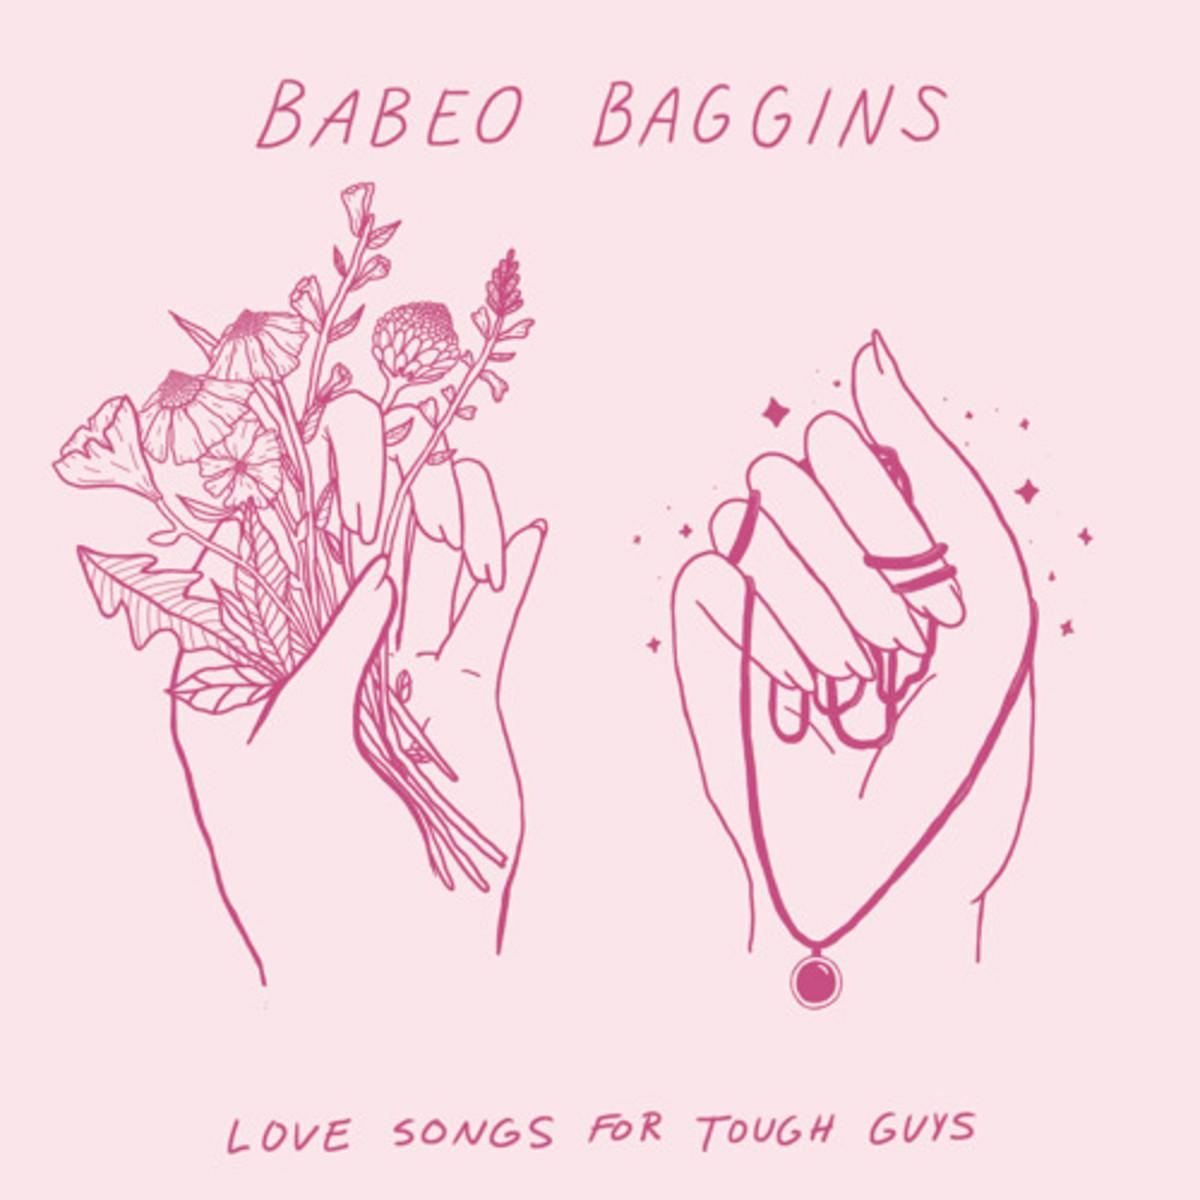 babeo-baggins-love-songs-for-tough-guys.jpg